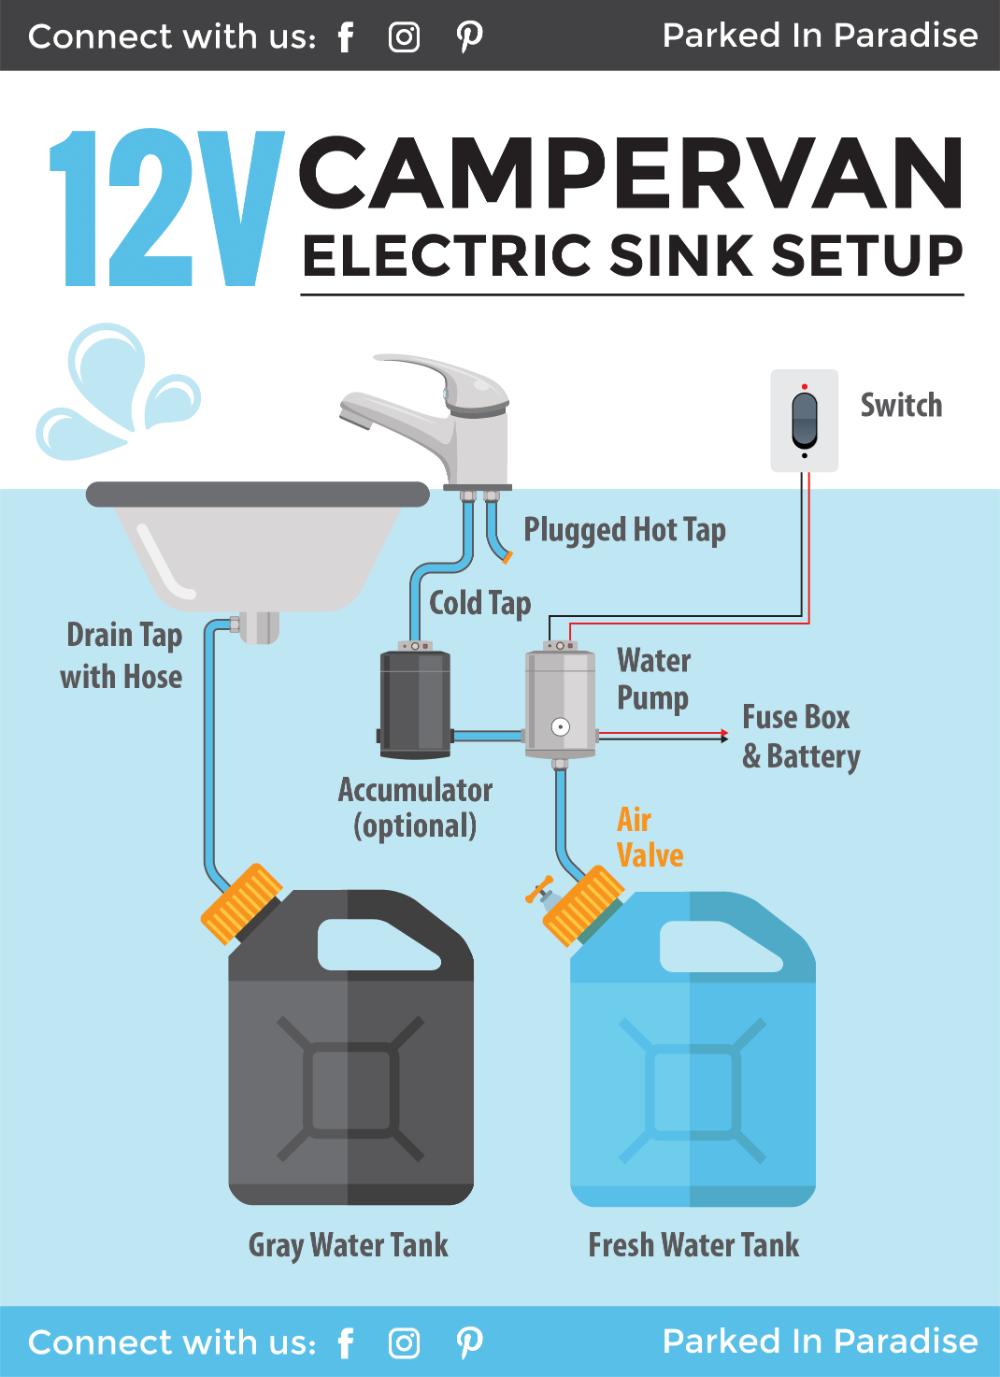 Installing A Camper Van Water System [Sink & Plumbing